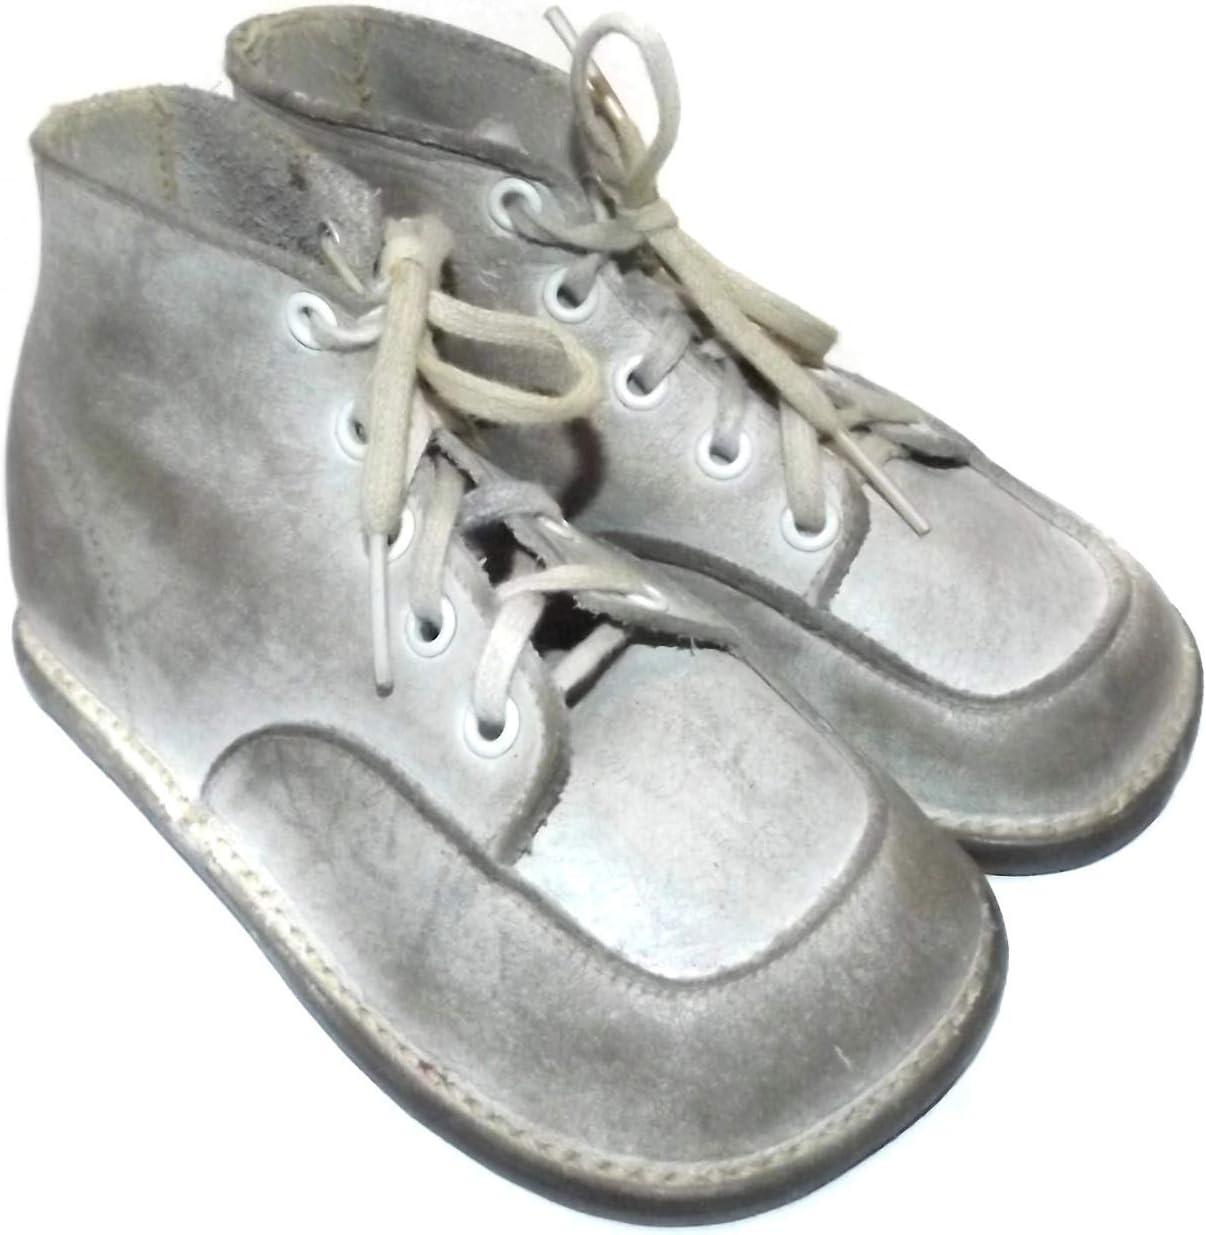 Worn Wee Walker Junior Baby Shoes